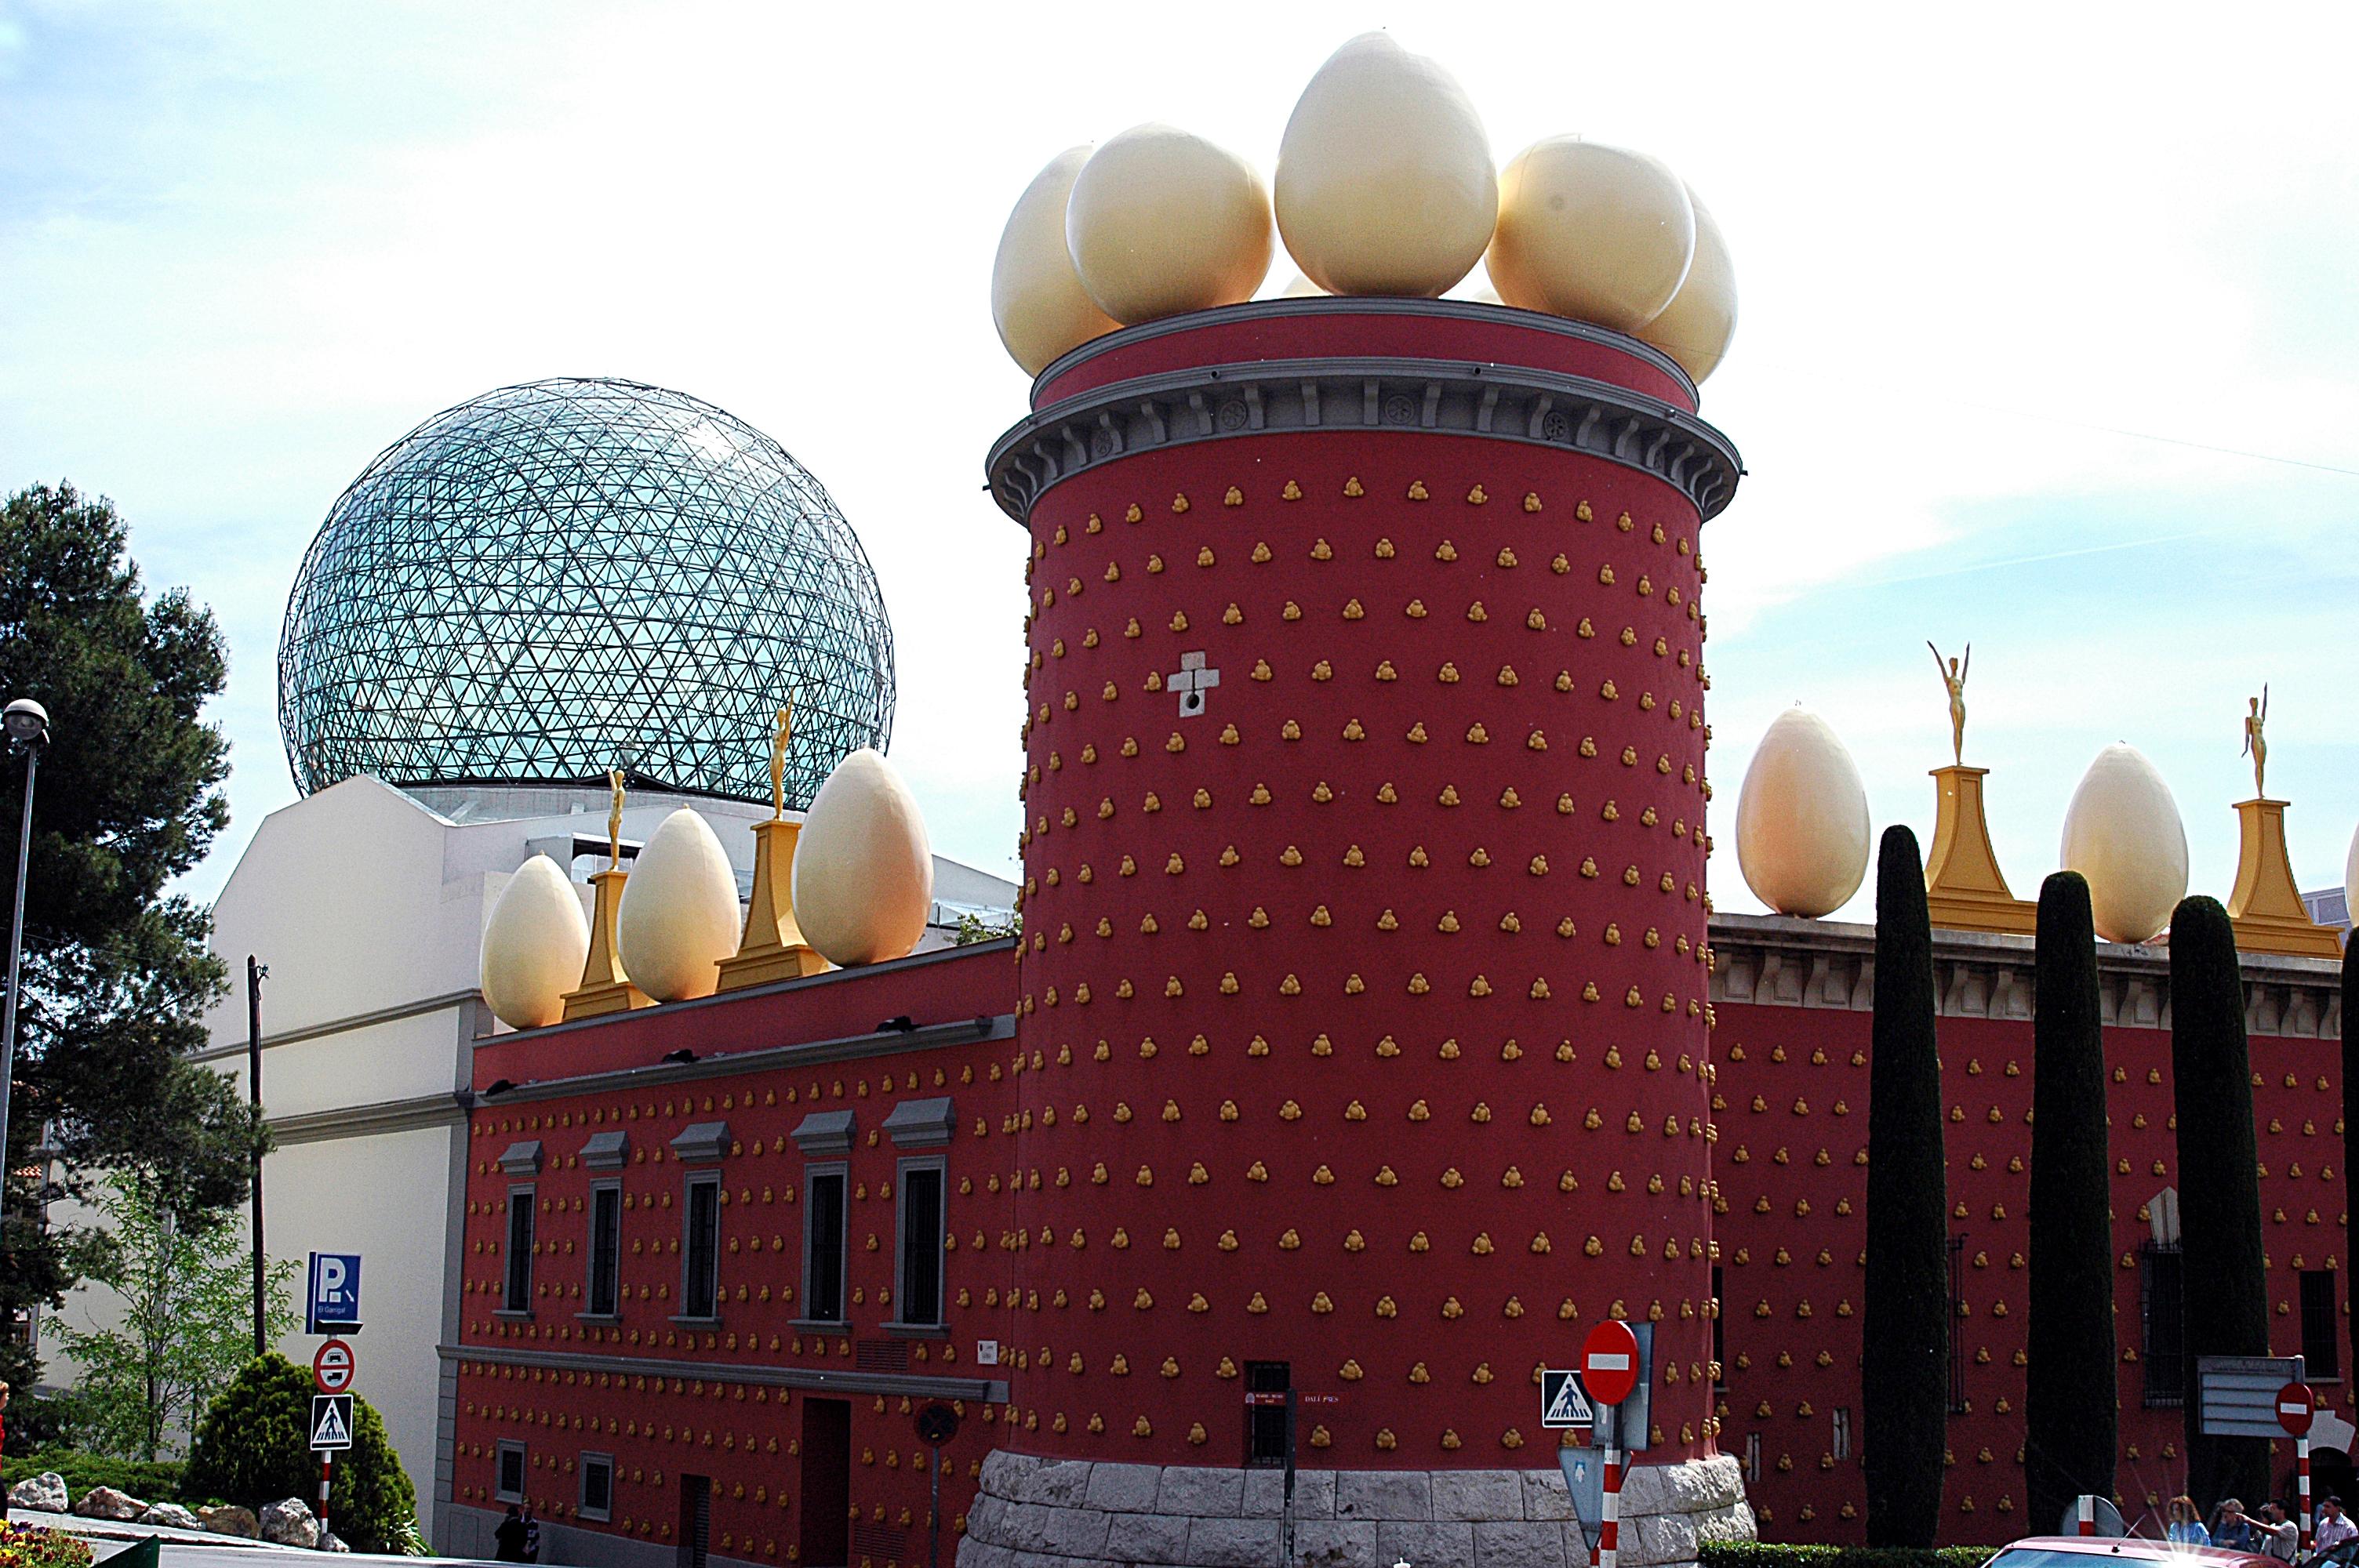 https://upload.wikimedia.org/wikipedia/commons/4/40/117_Figueres,_torre_Galatea_i_c%C3%BApula_del_Museu_Dal%C3%AD.JPG